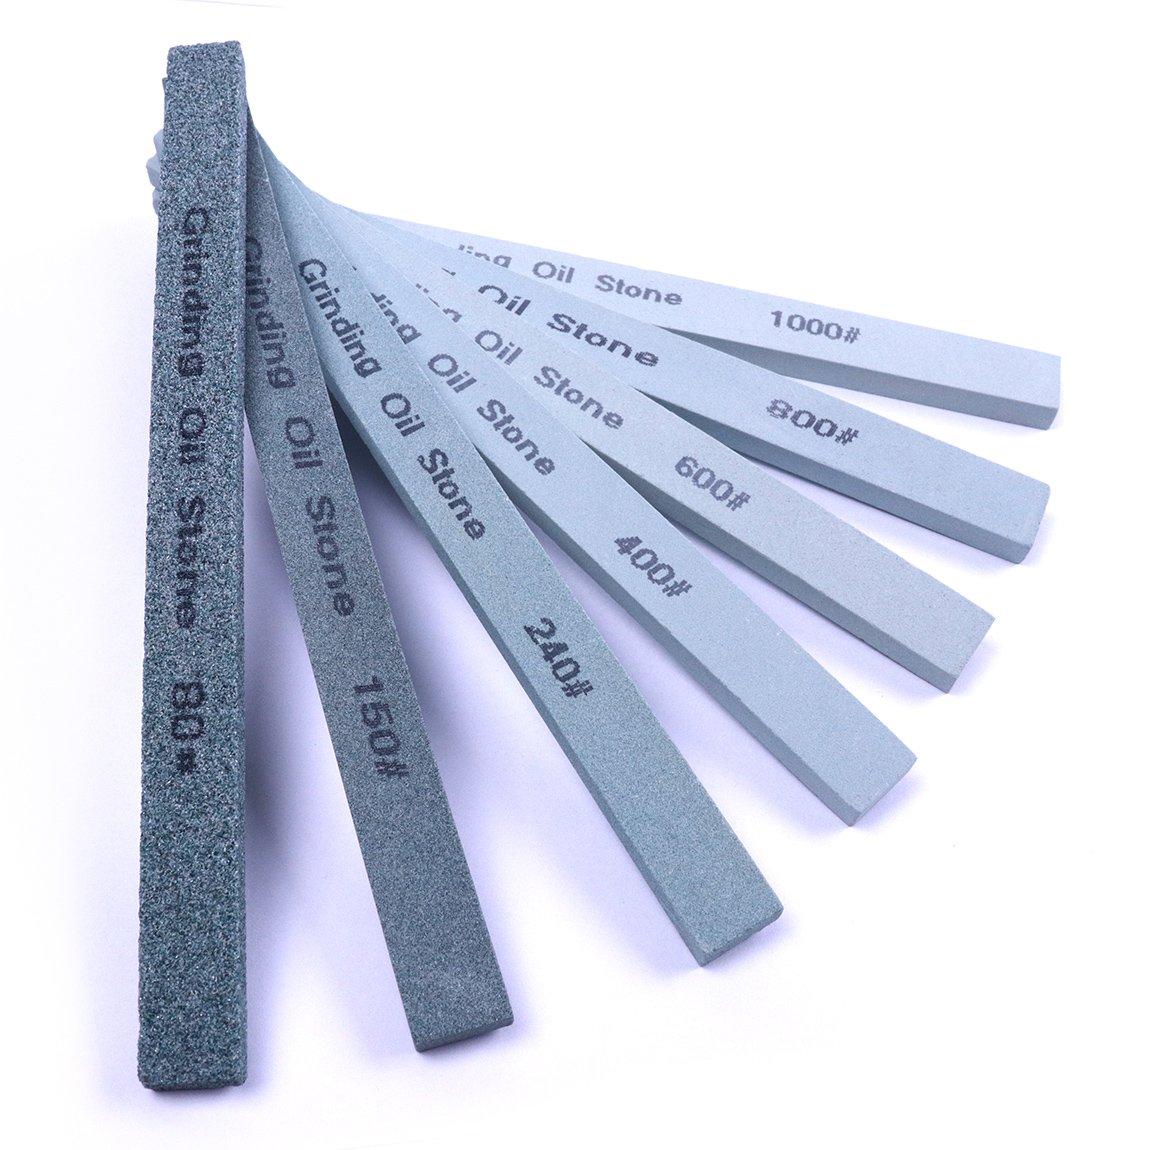 Alle Grits, 7pcs 240# ATOPLEE Gr/ün Silikon-Carbon-Polier Oilstone f/ür Keramik gemaltes Metall Schleifkorn 80# 600# 400# 150# 1000# 800#